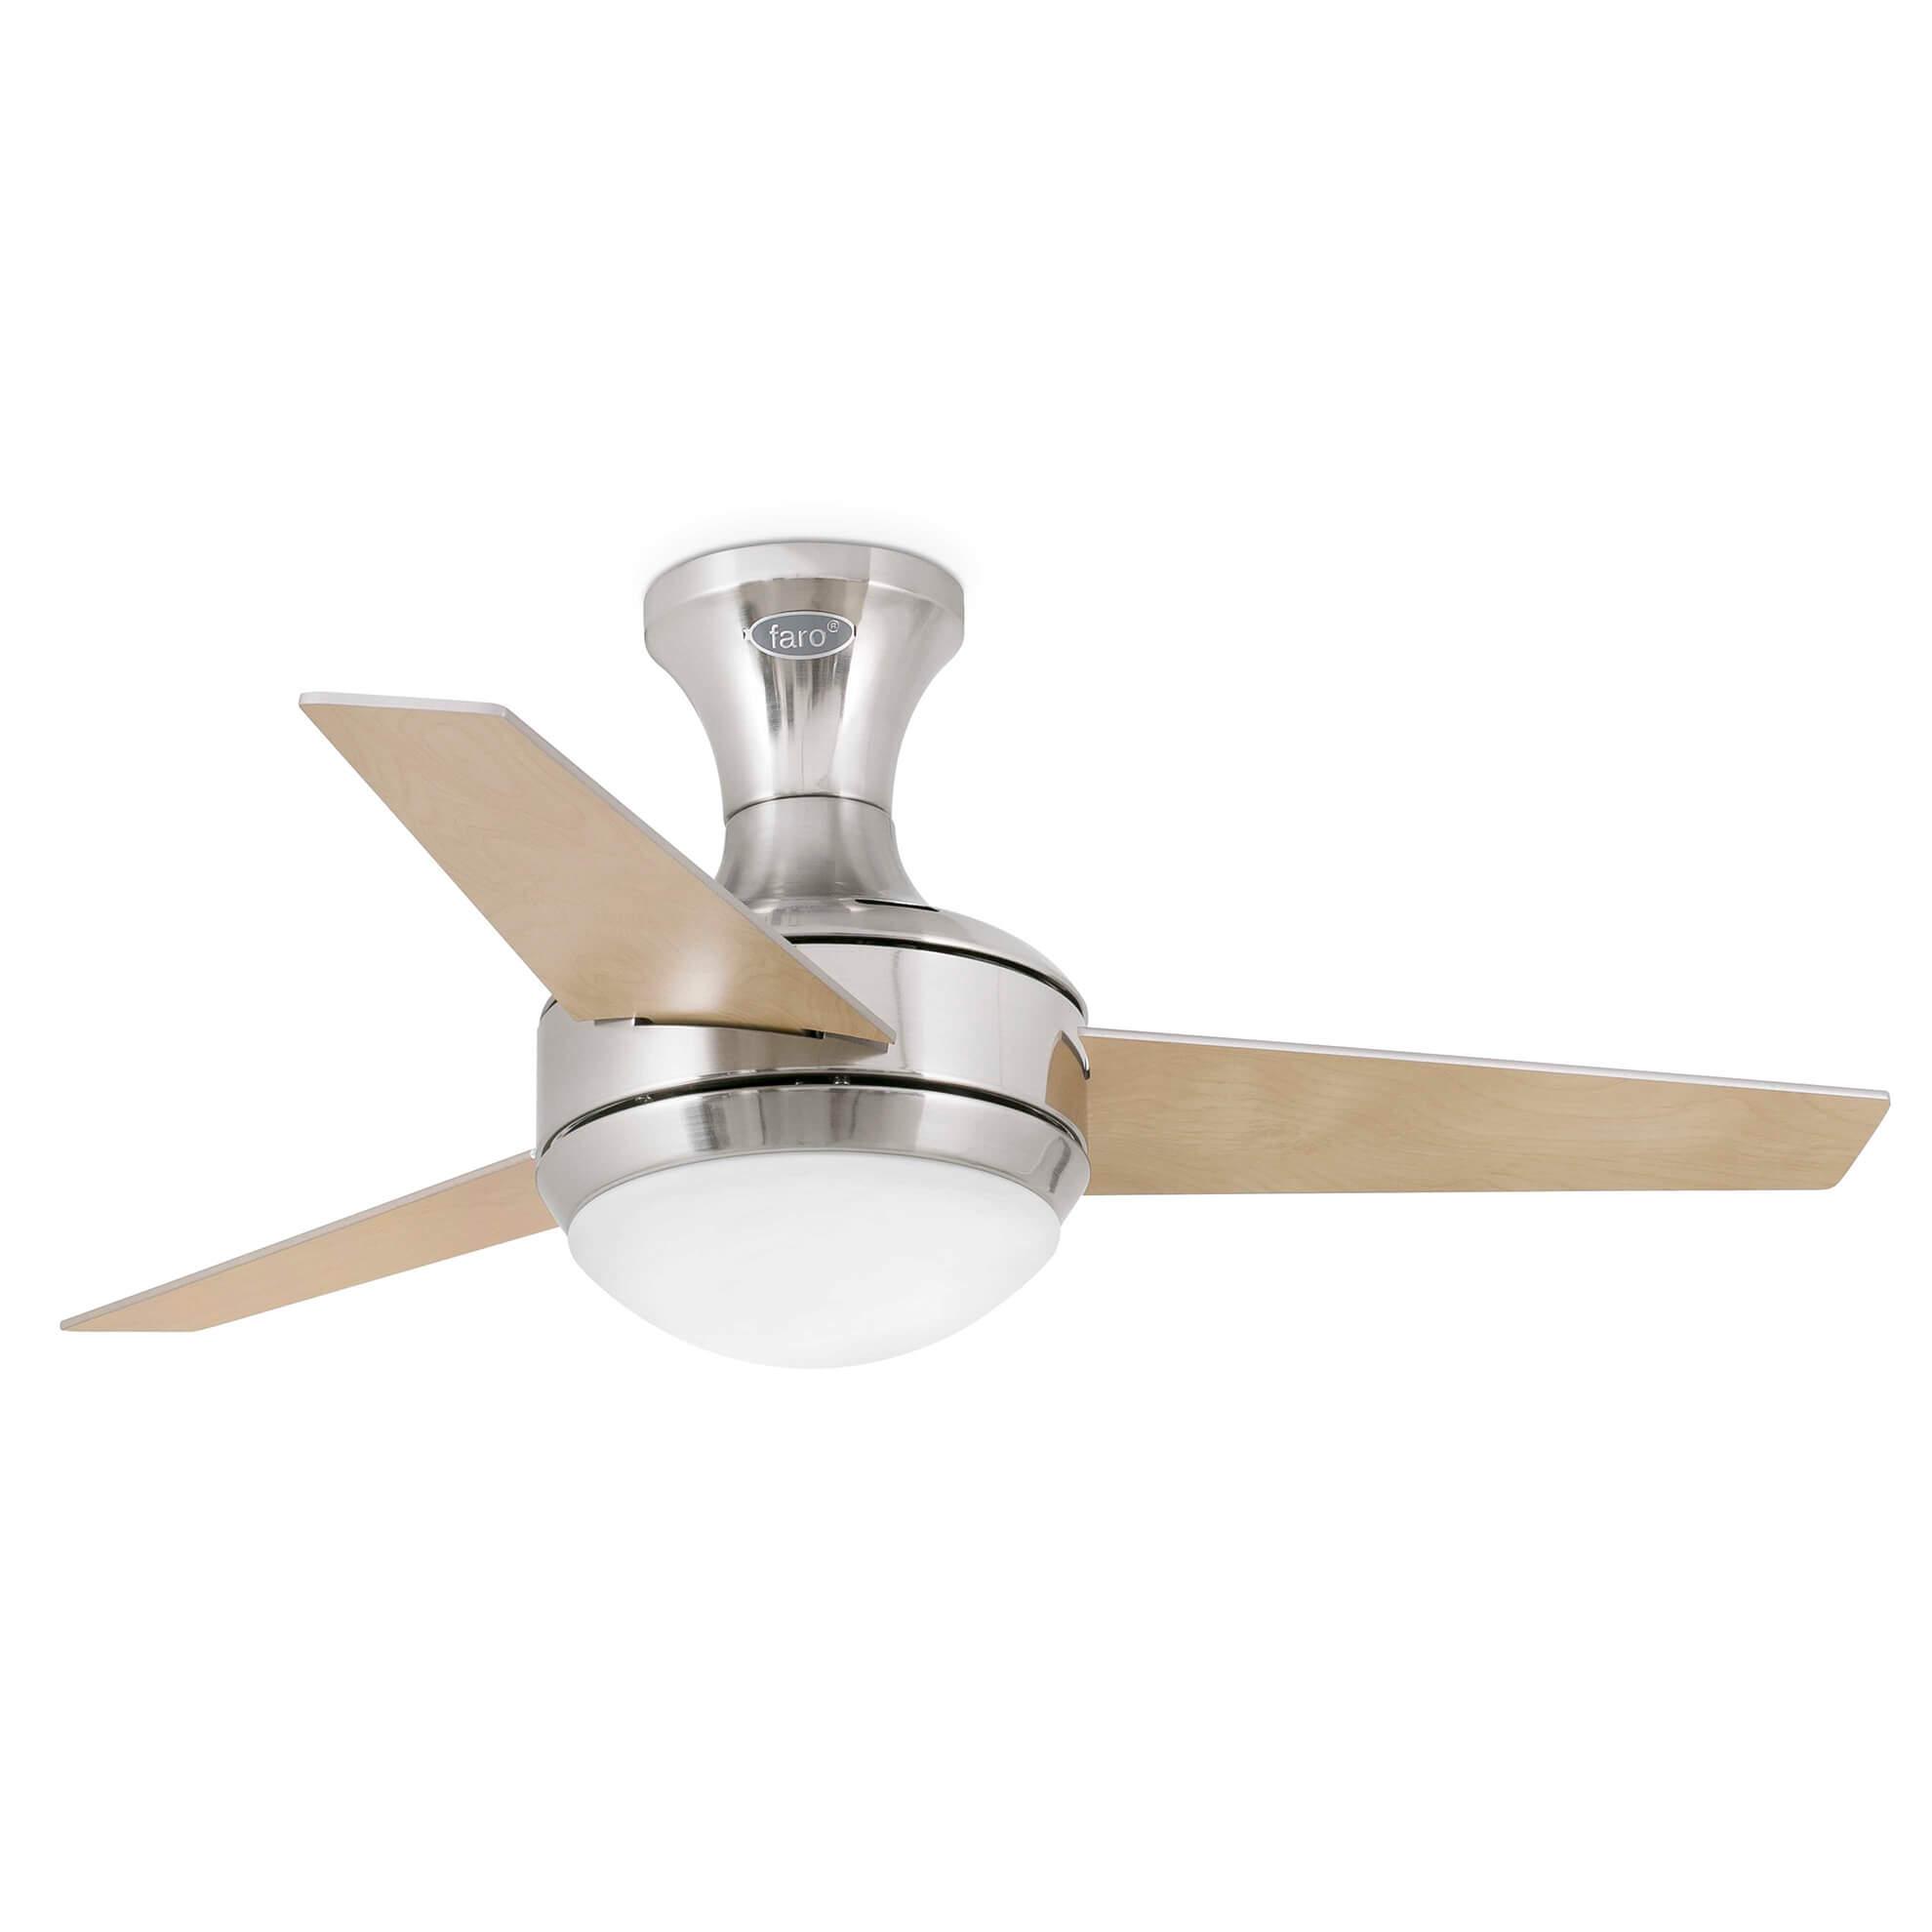 Stropný ventilátor FARO MINI UFO 33455